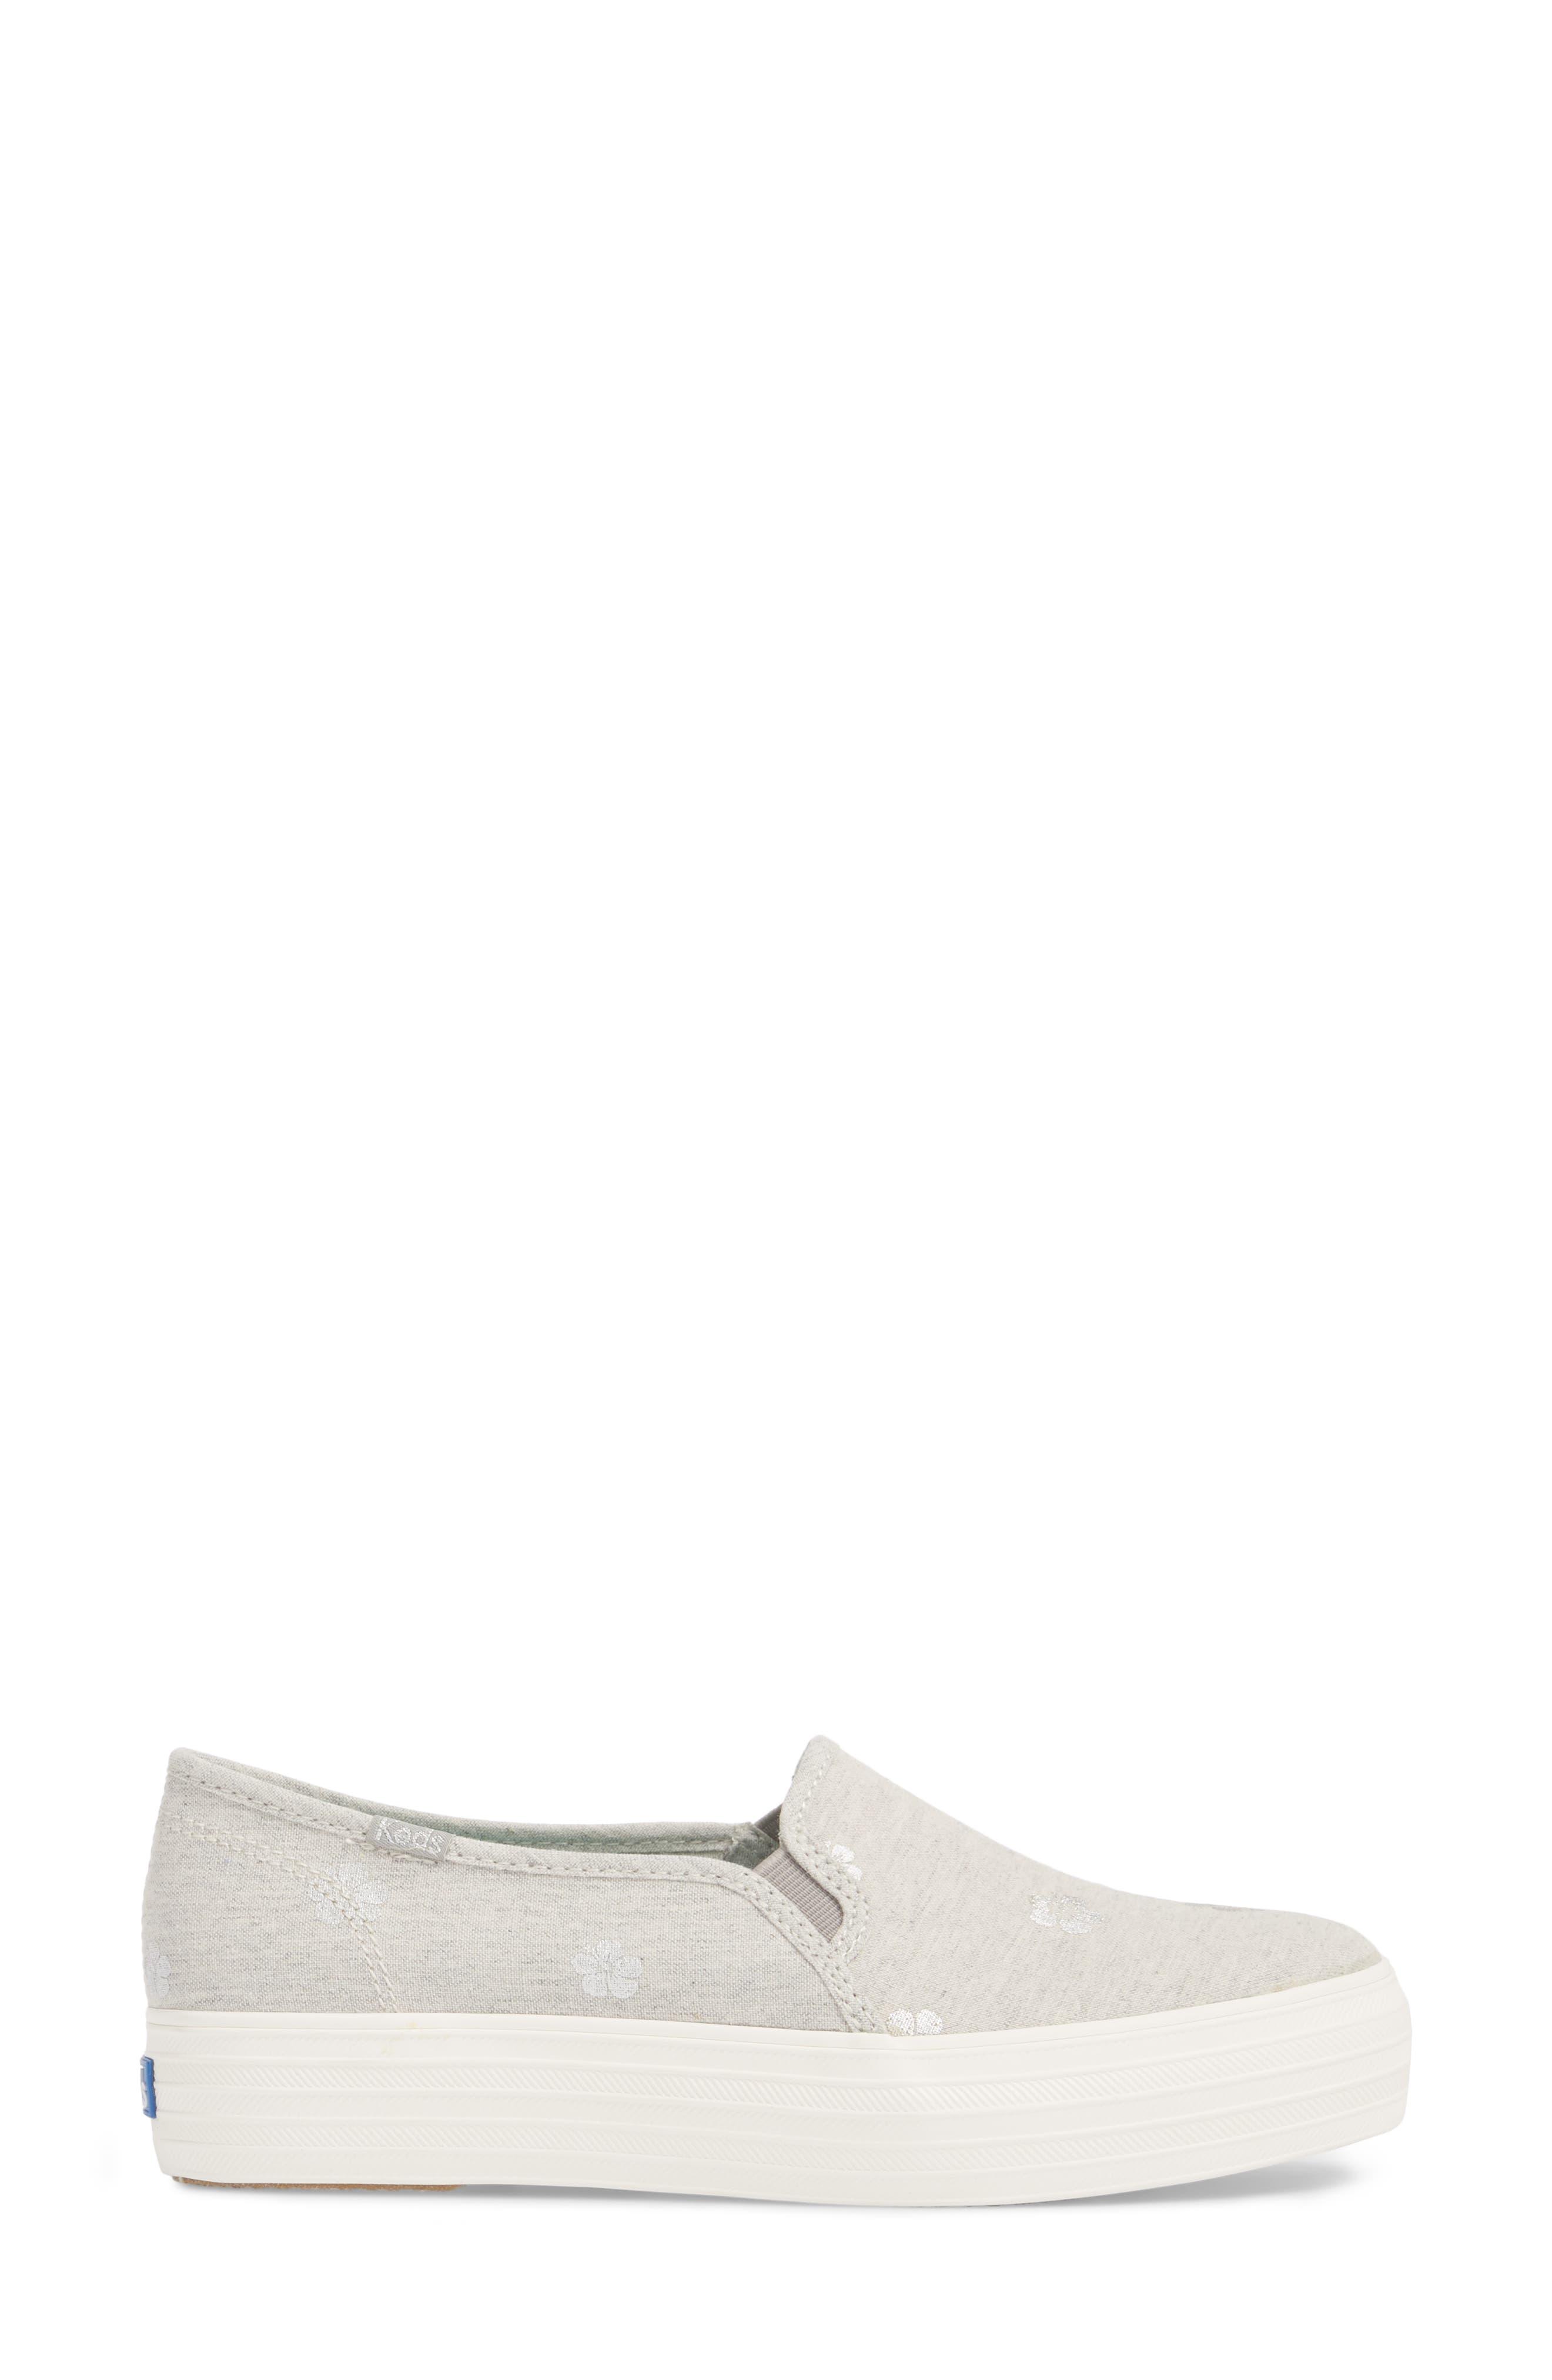 Triple Decker Hibiscus Slip-On Platform Sneaker,                             Alternate thumbnail 3, color,                             050